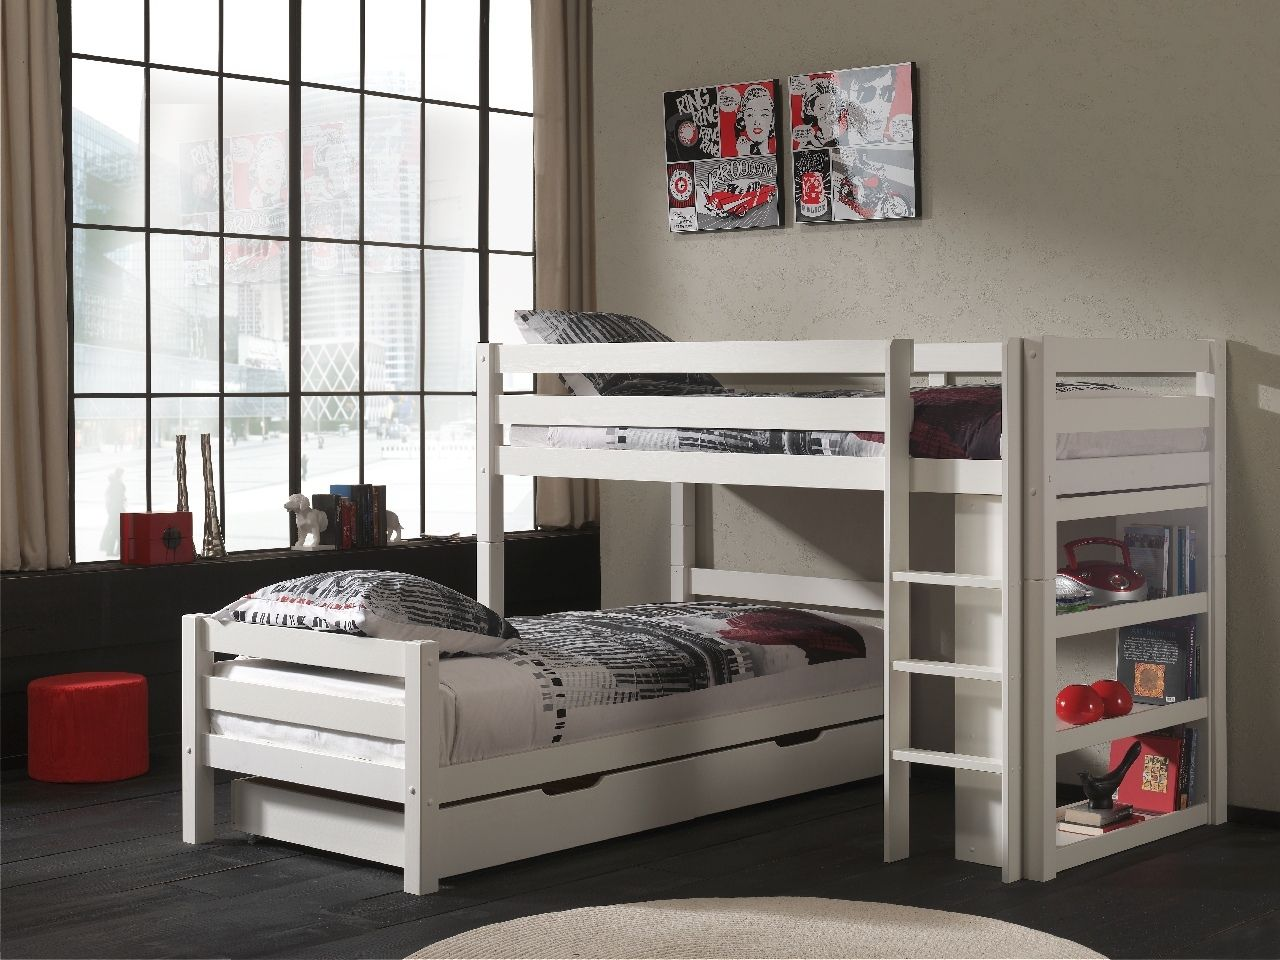 Vipack 'Pino' Winkel-Etagenbett 90x200 cm, weiß, Kiefer massiv, mit Bettschubladen Bild 1